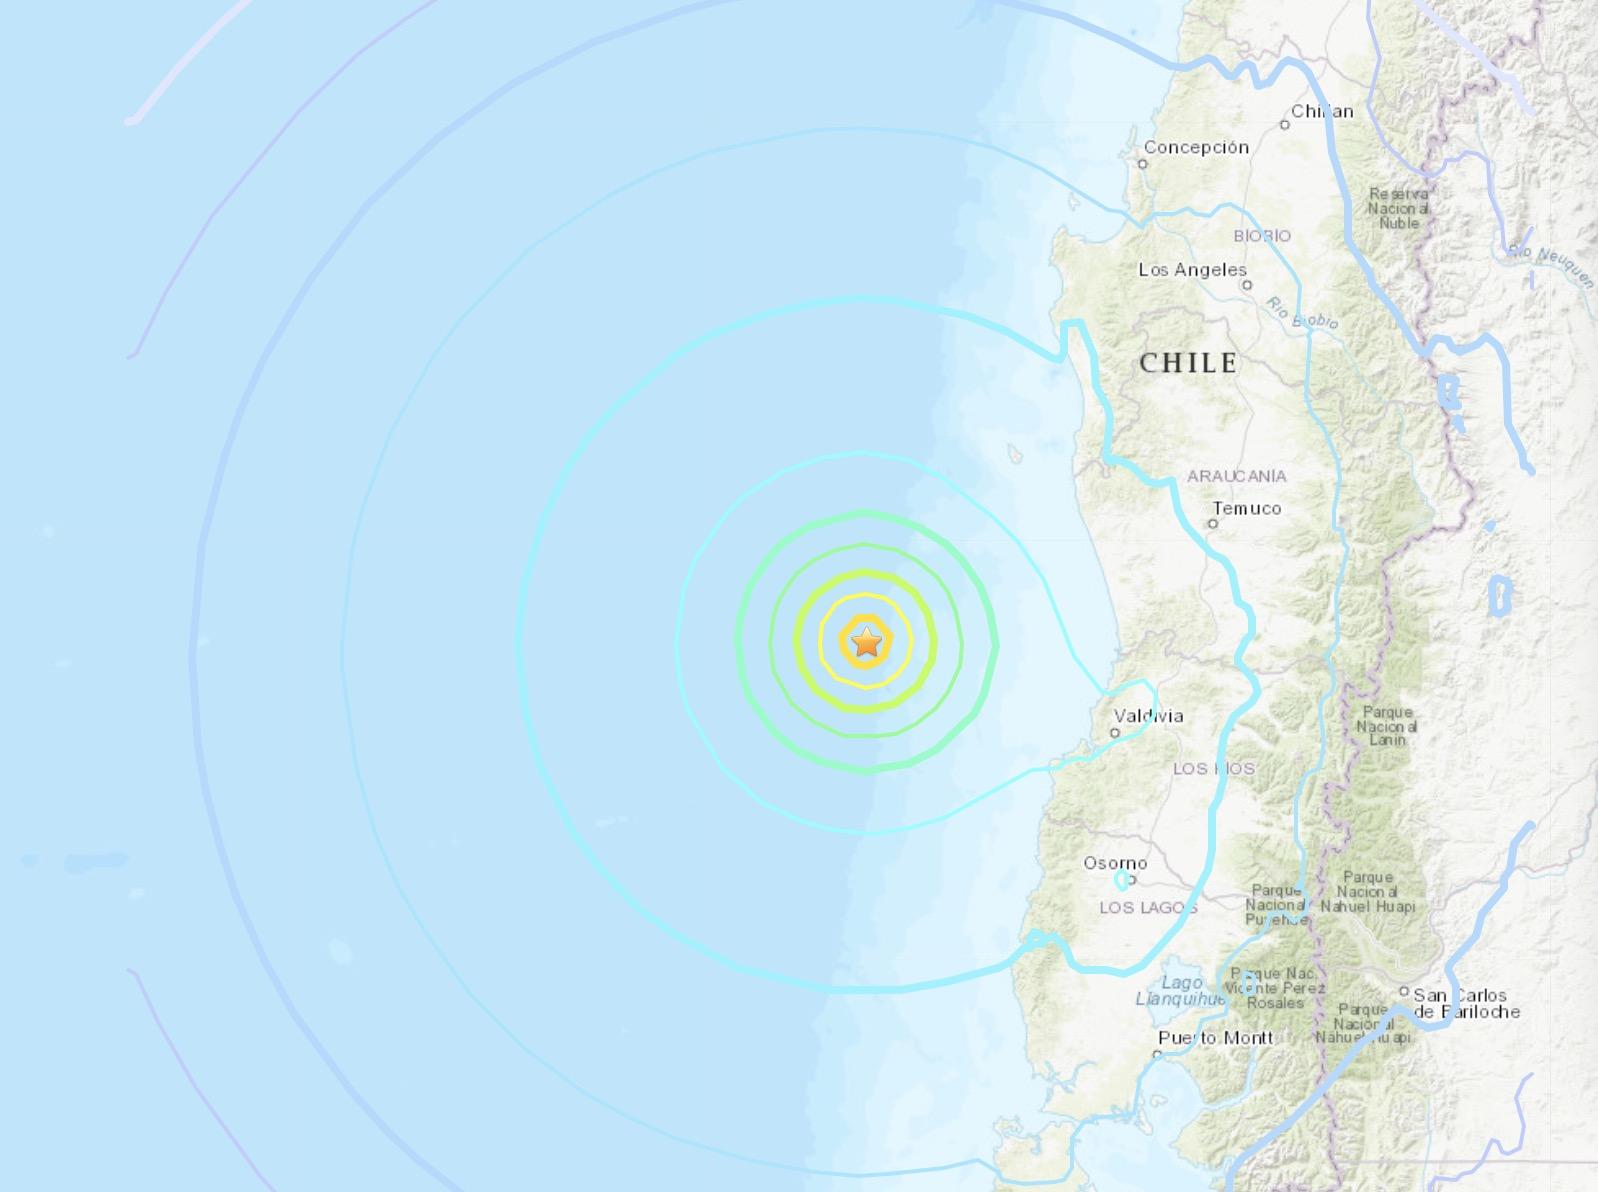 6.8-magnitude quake hits 151 km WNW of Corral, Chile: USGS